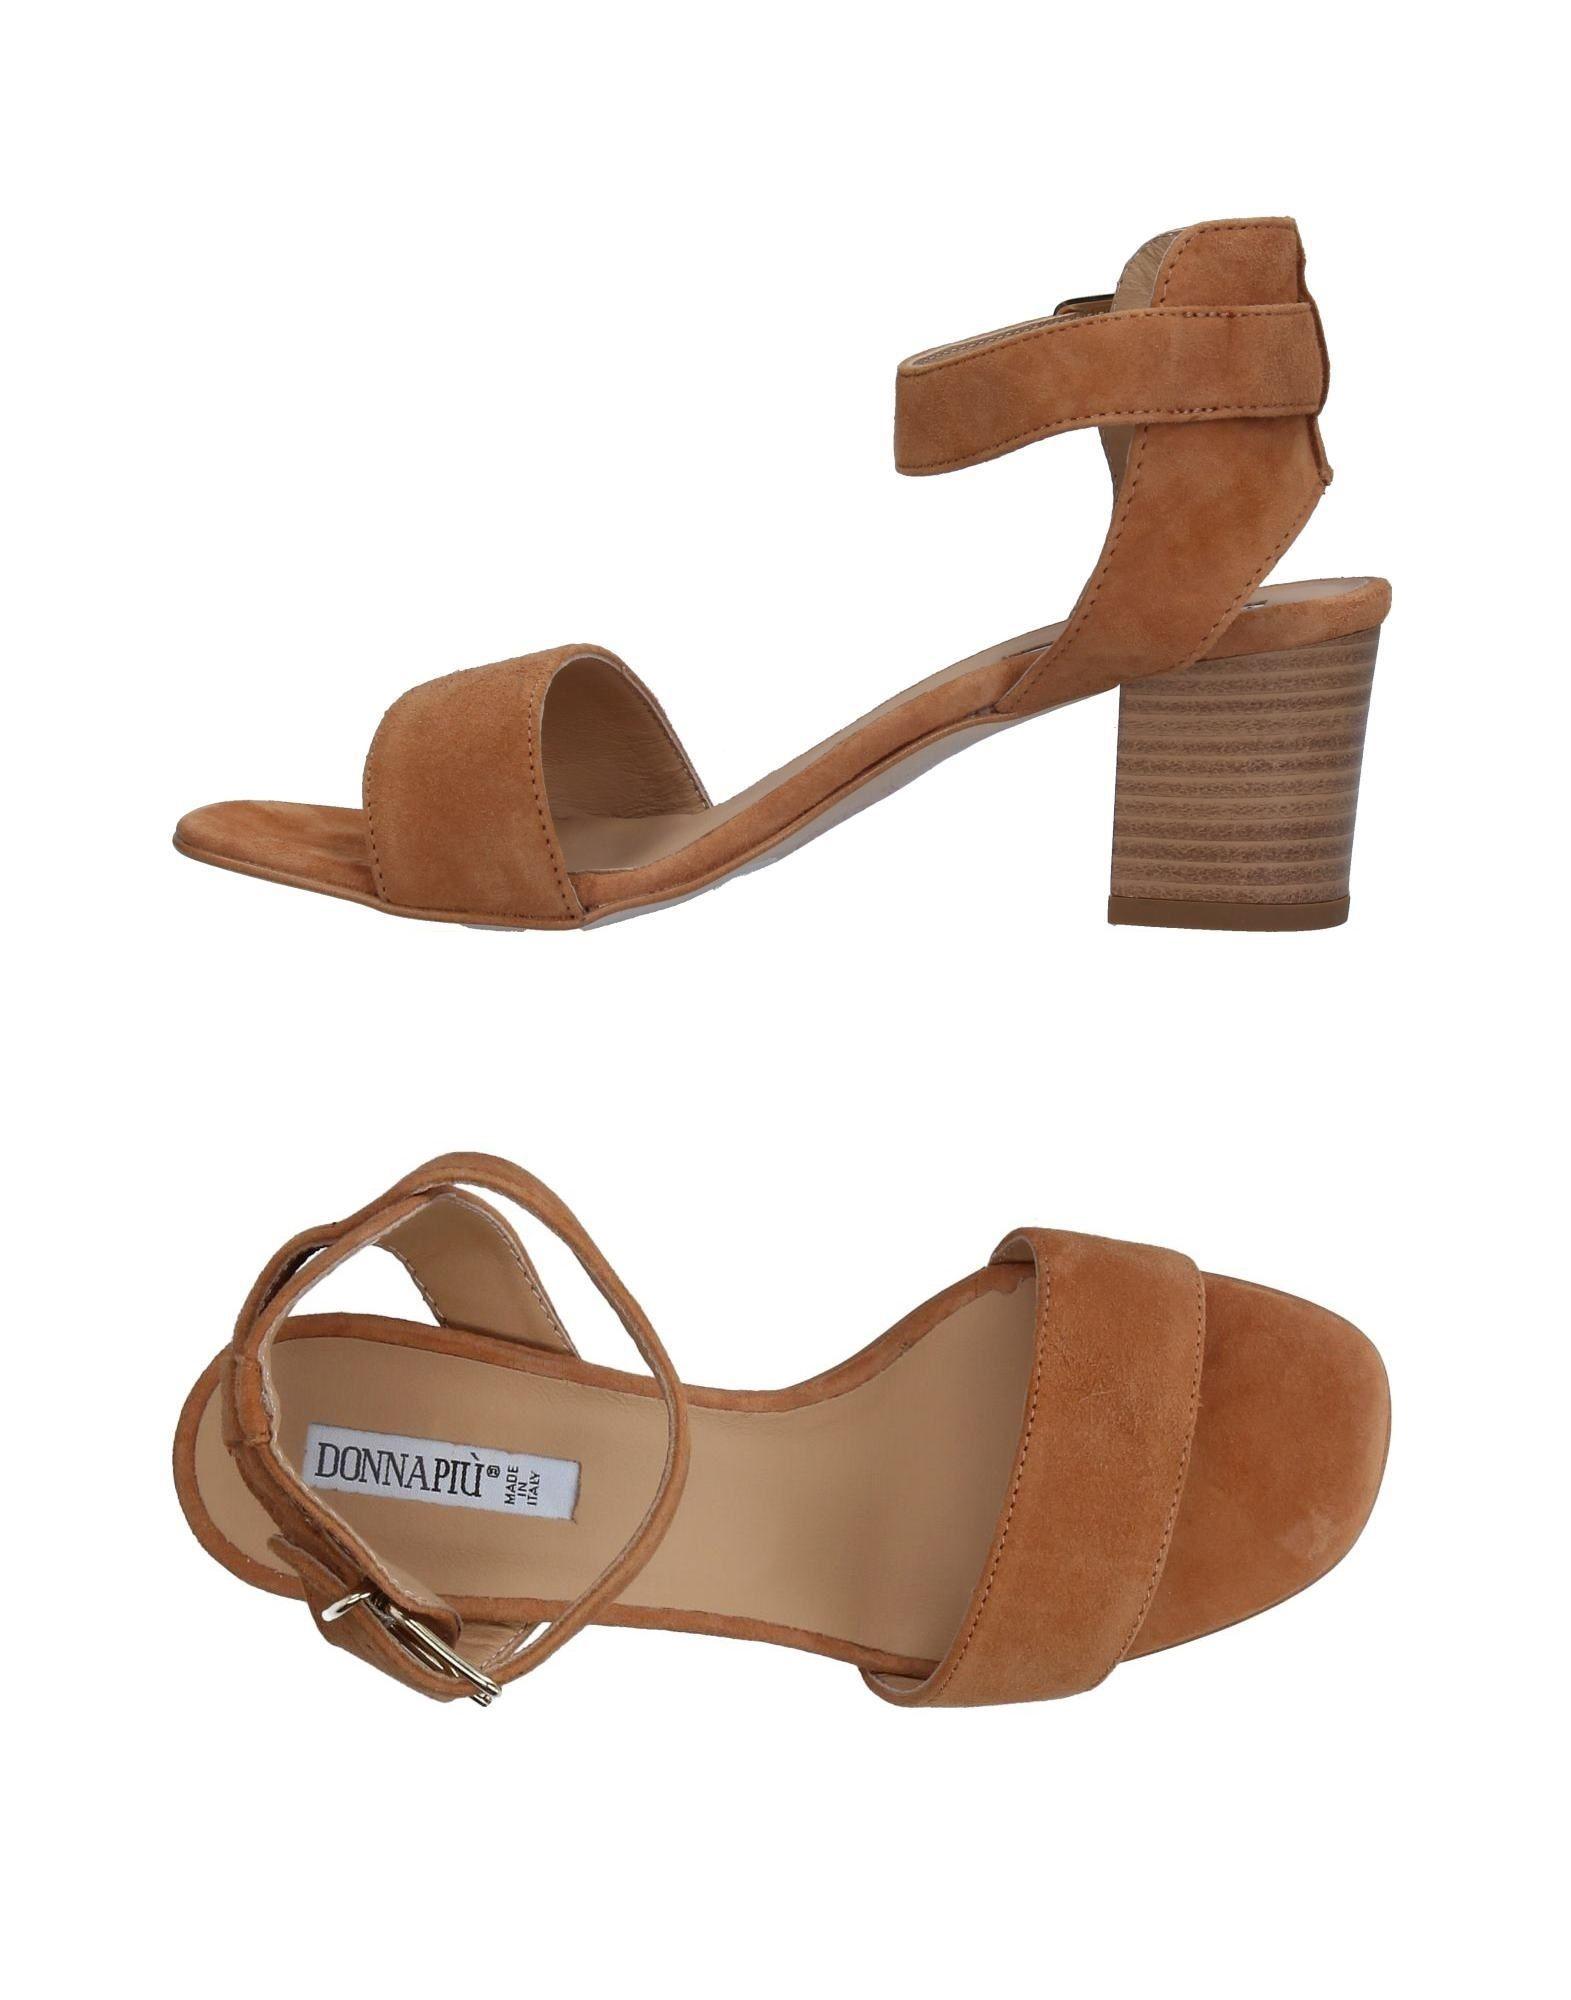 Donna Più Sandalen Damen  11331781NV Gute Qualität beliebte Schuhe